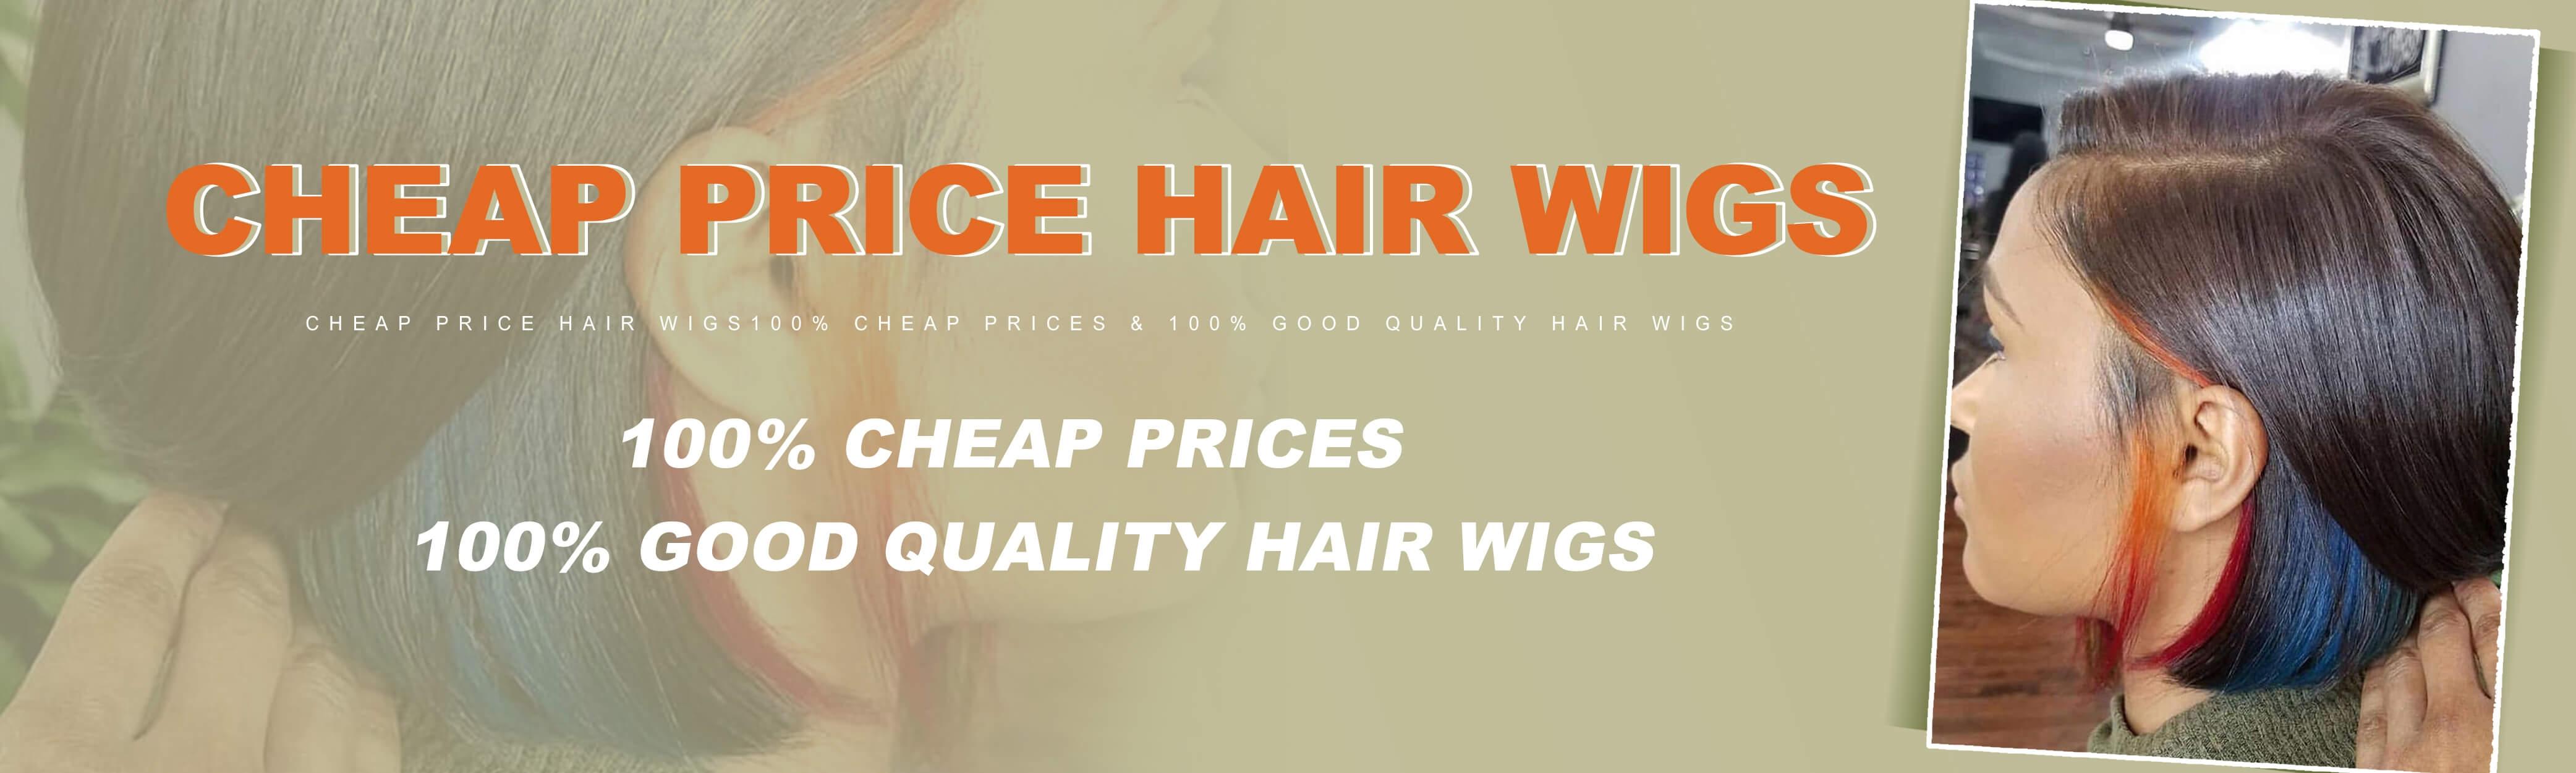 $40-$90 Price Wigs